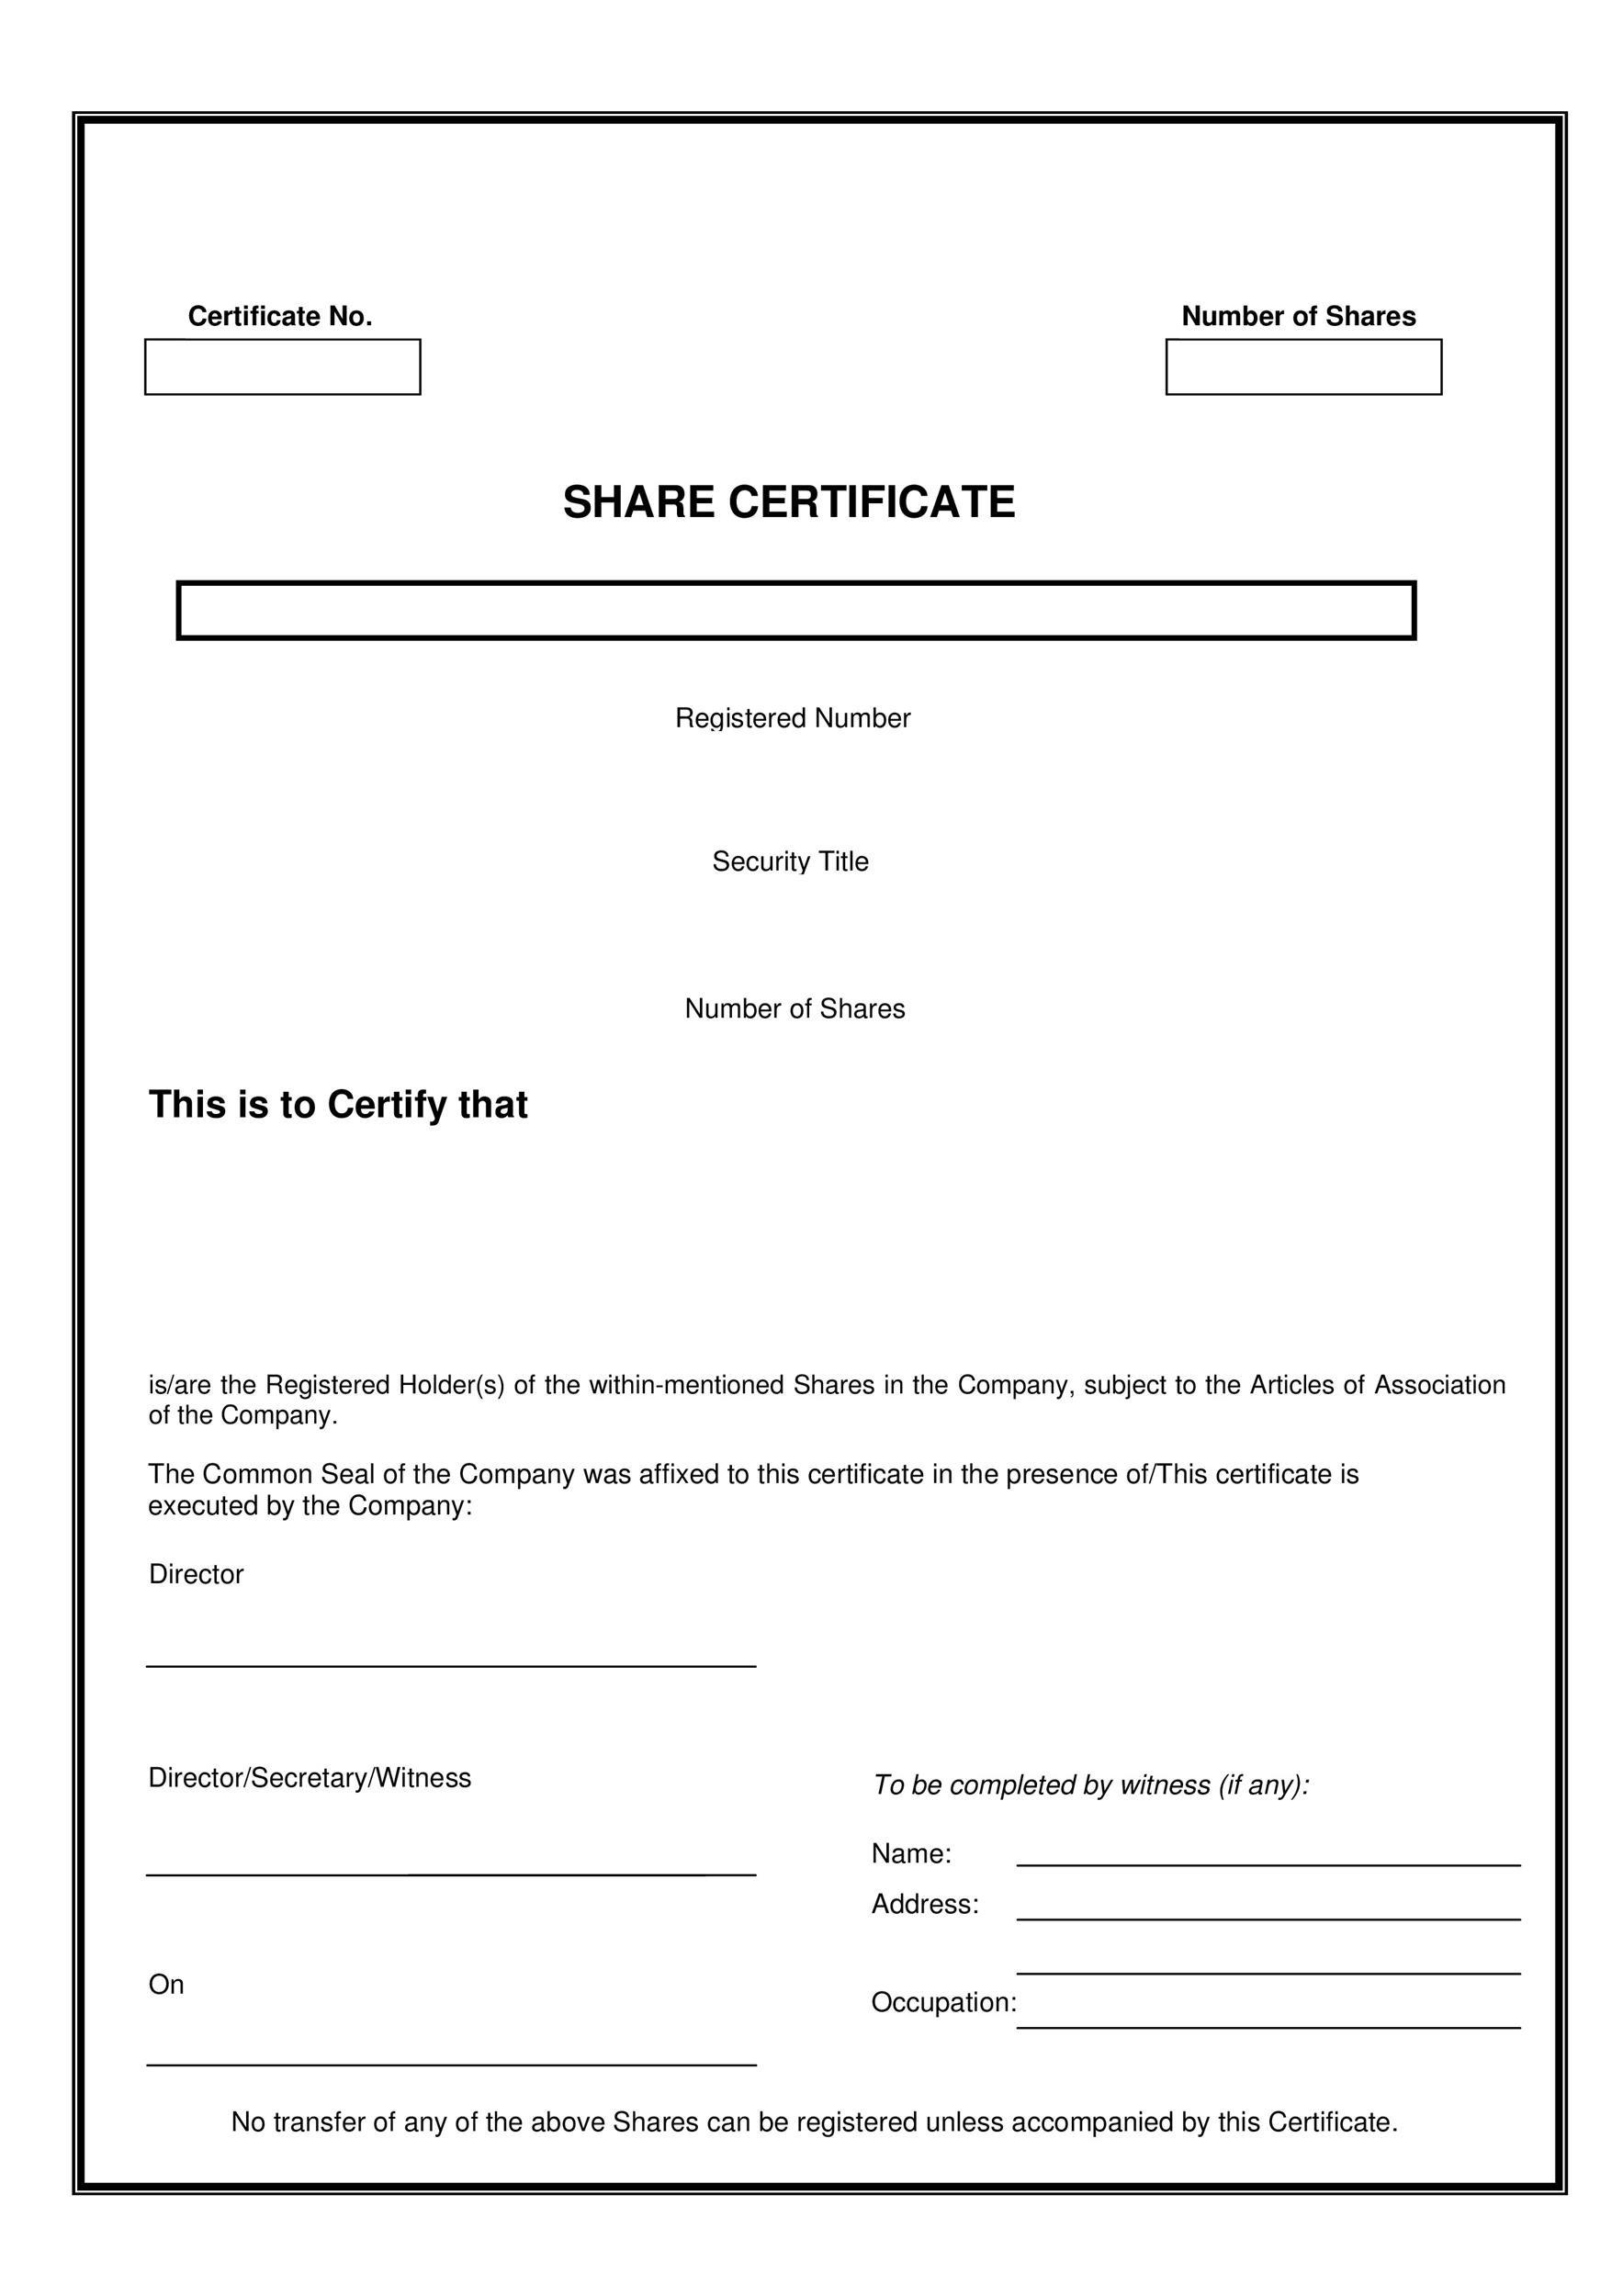 40+ Free Stock Certificate Templates (Word, PDF